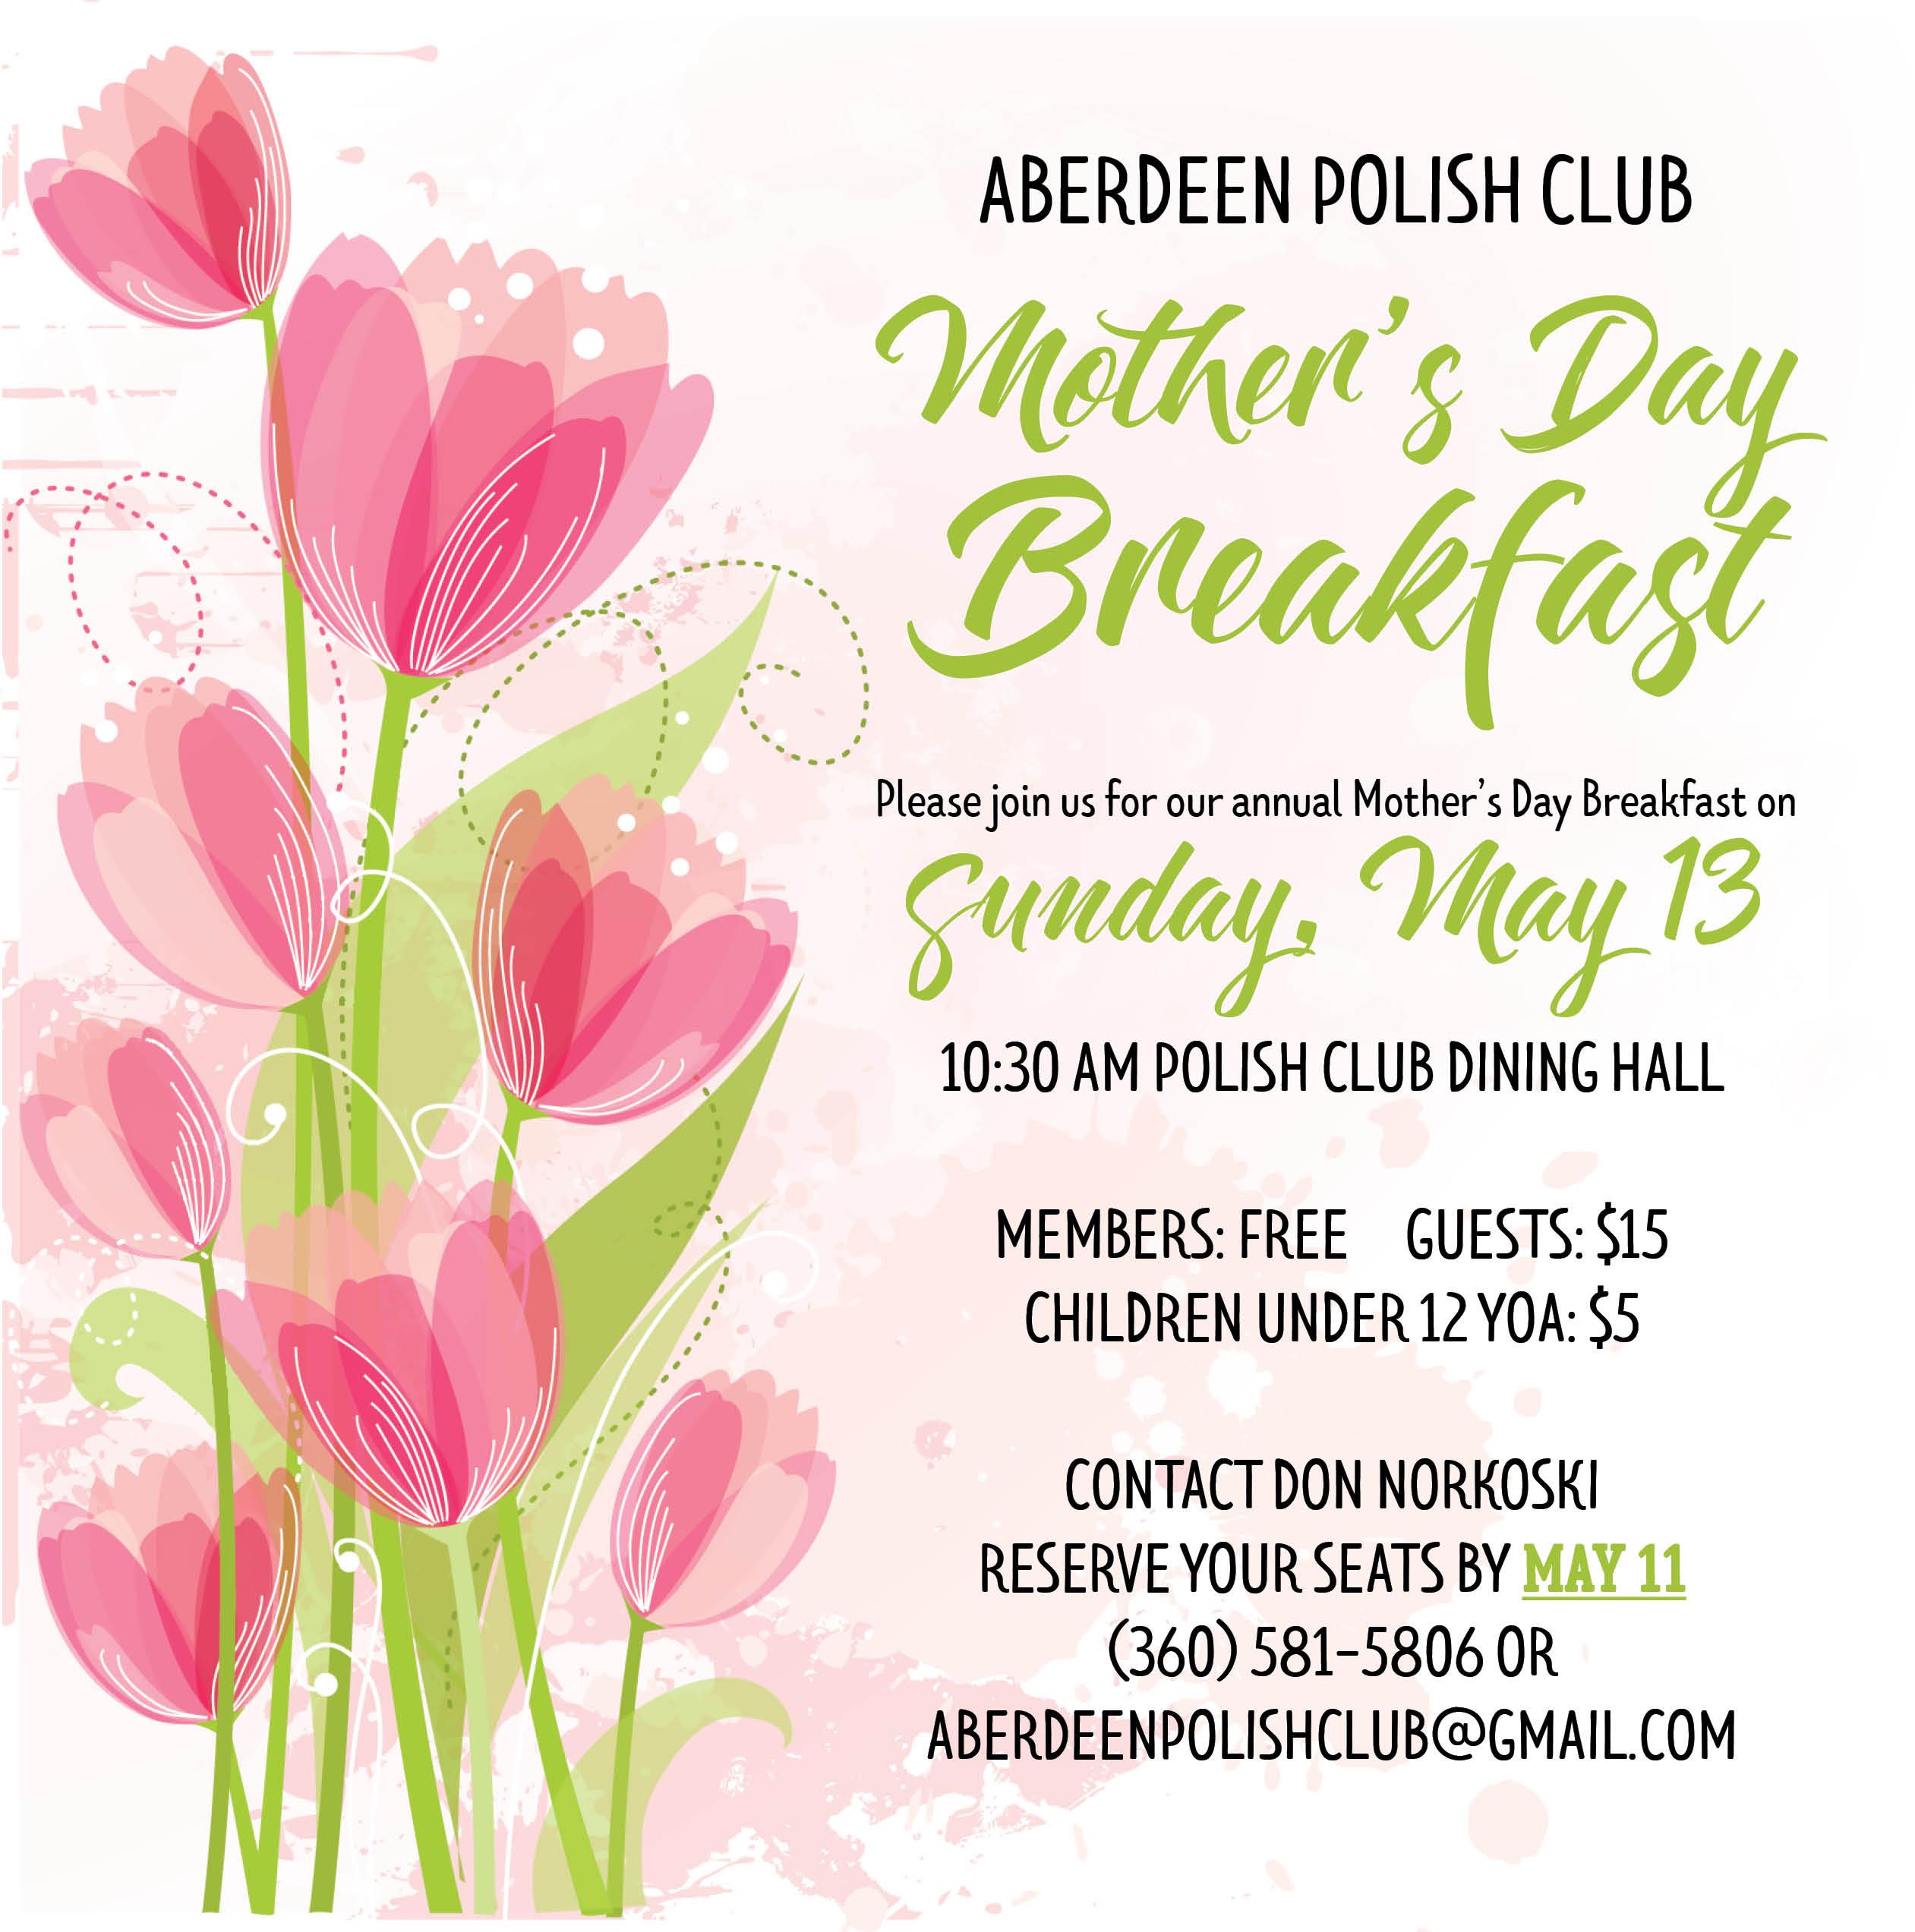 Mothers Day Breakfast 2018 Polish Club Aberdeen Wa